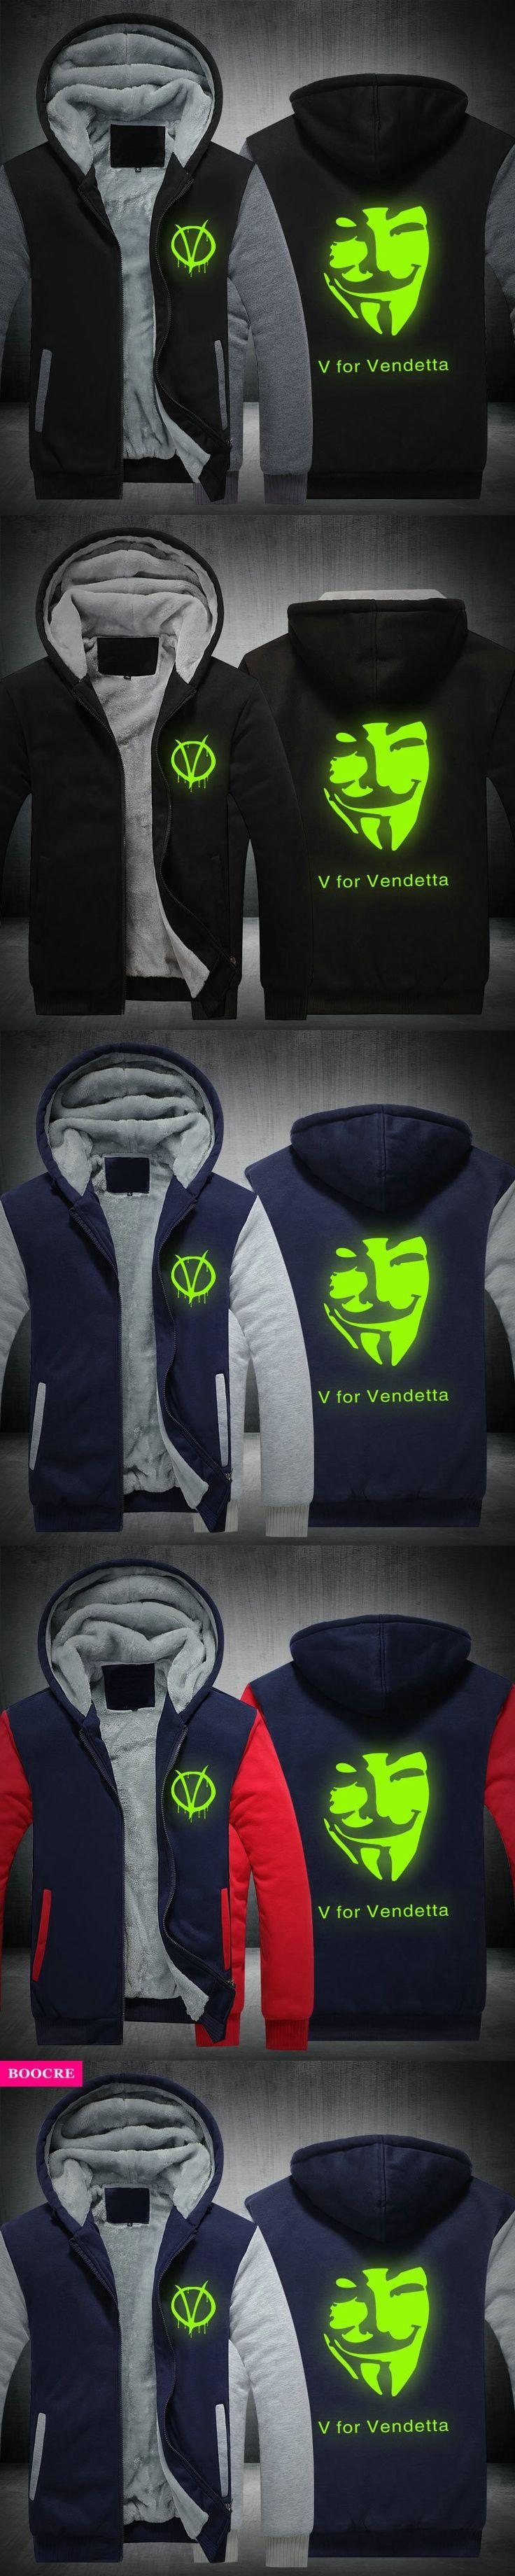 BOOCRE Winter V For Vendetta Mask Rangers Men Hooded Sweatshirts Thicken Zipper Hoodies Outerwear Jackets USA EU Size Plus Siz